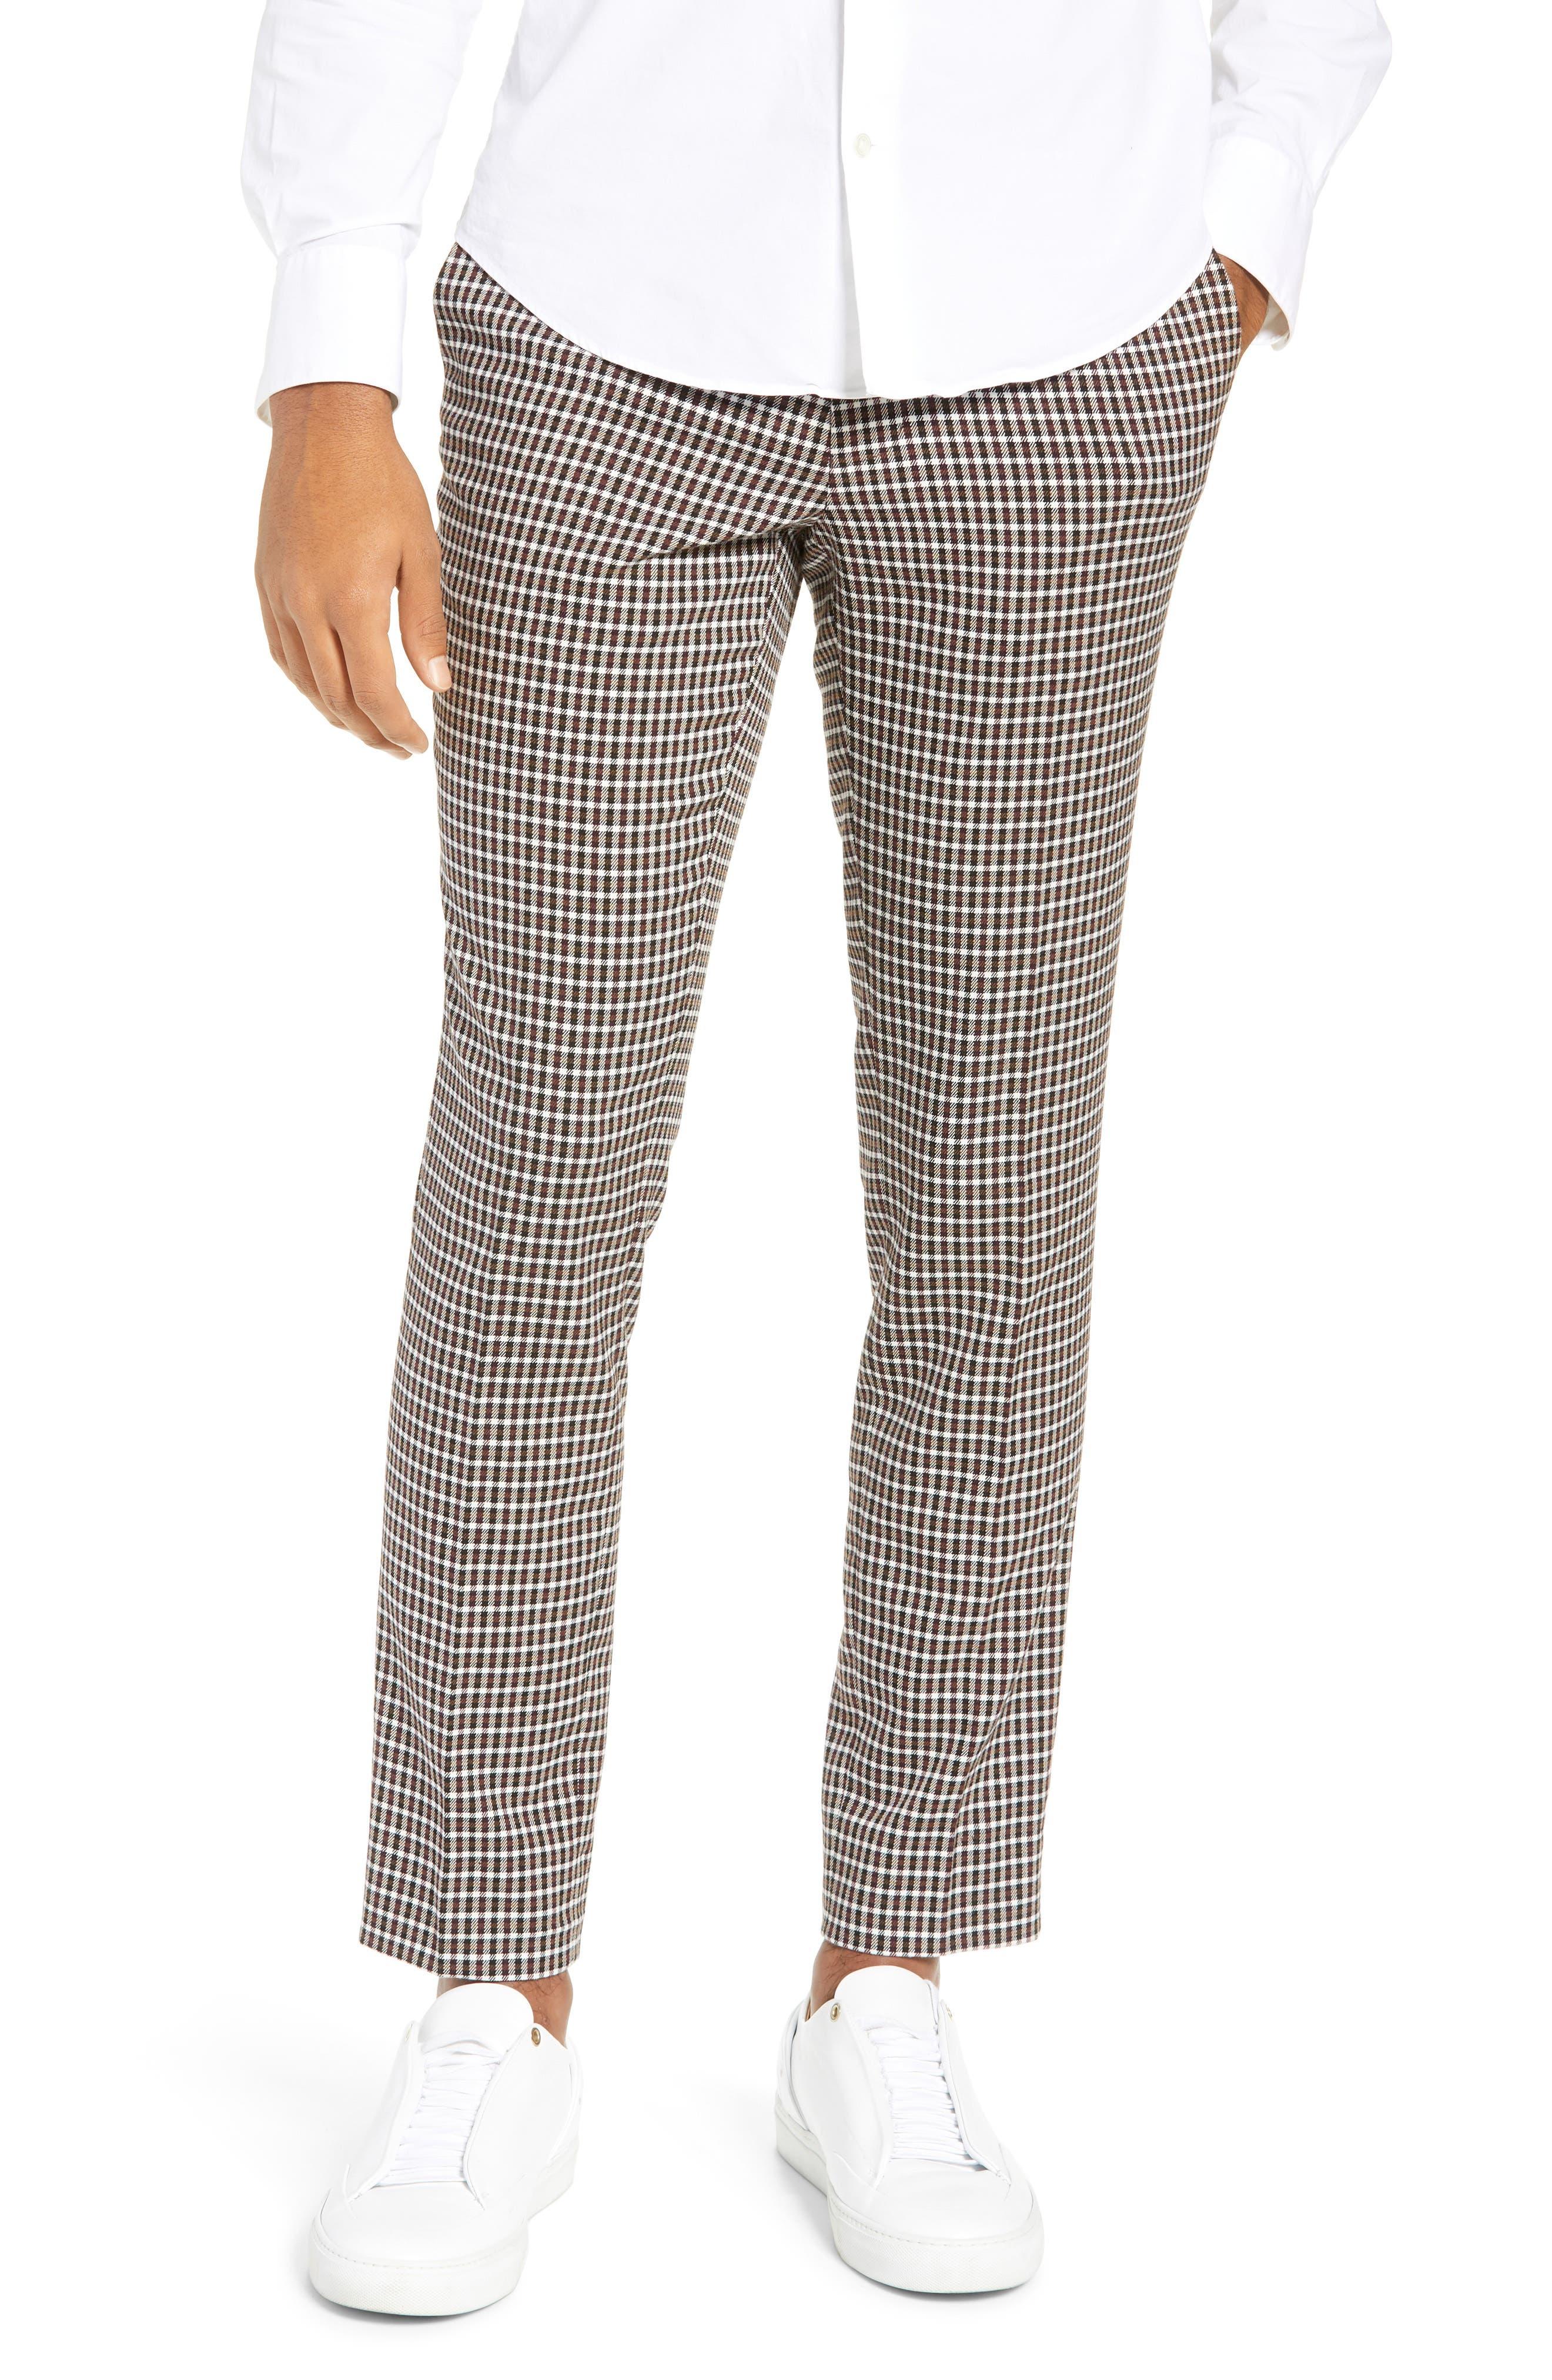 TOPMAN Multicheck Skinny Fit Trousers, Main, color, BLACK MULTI